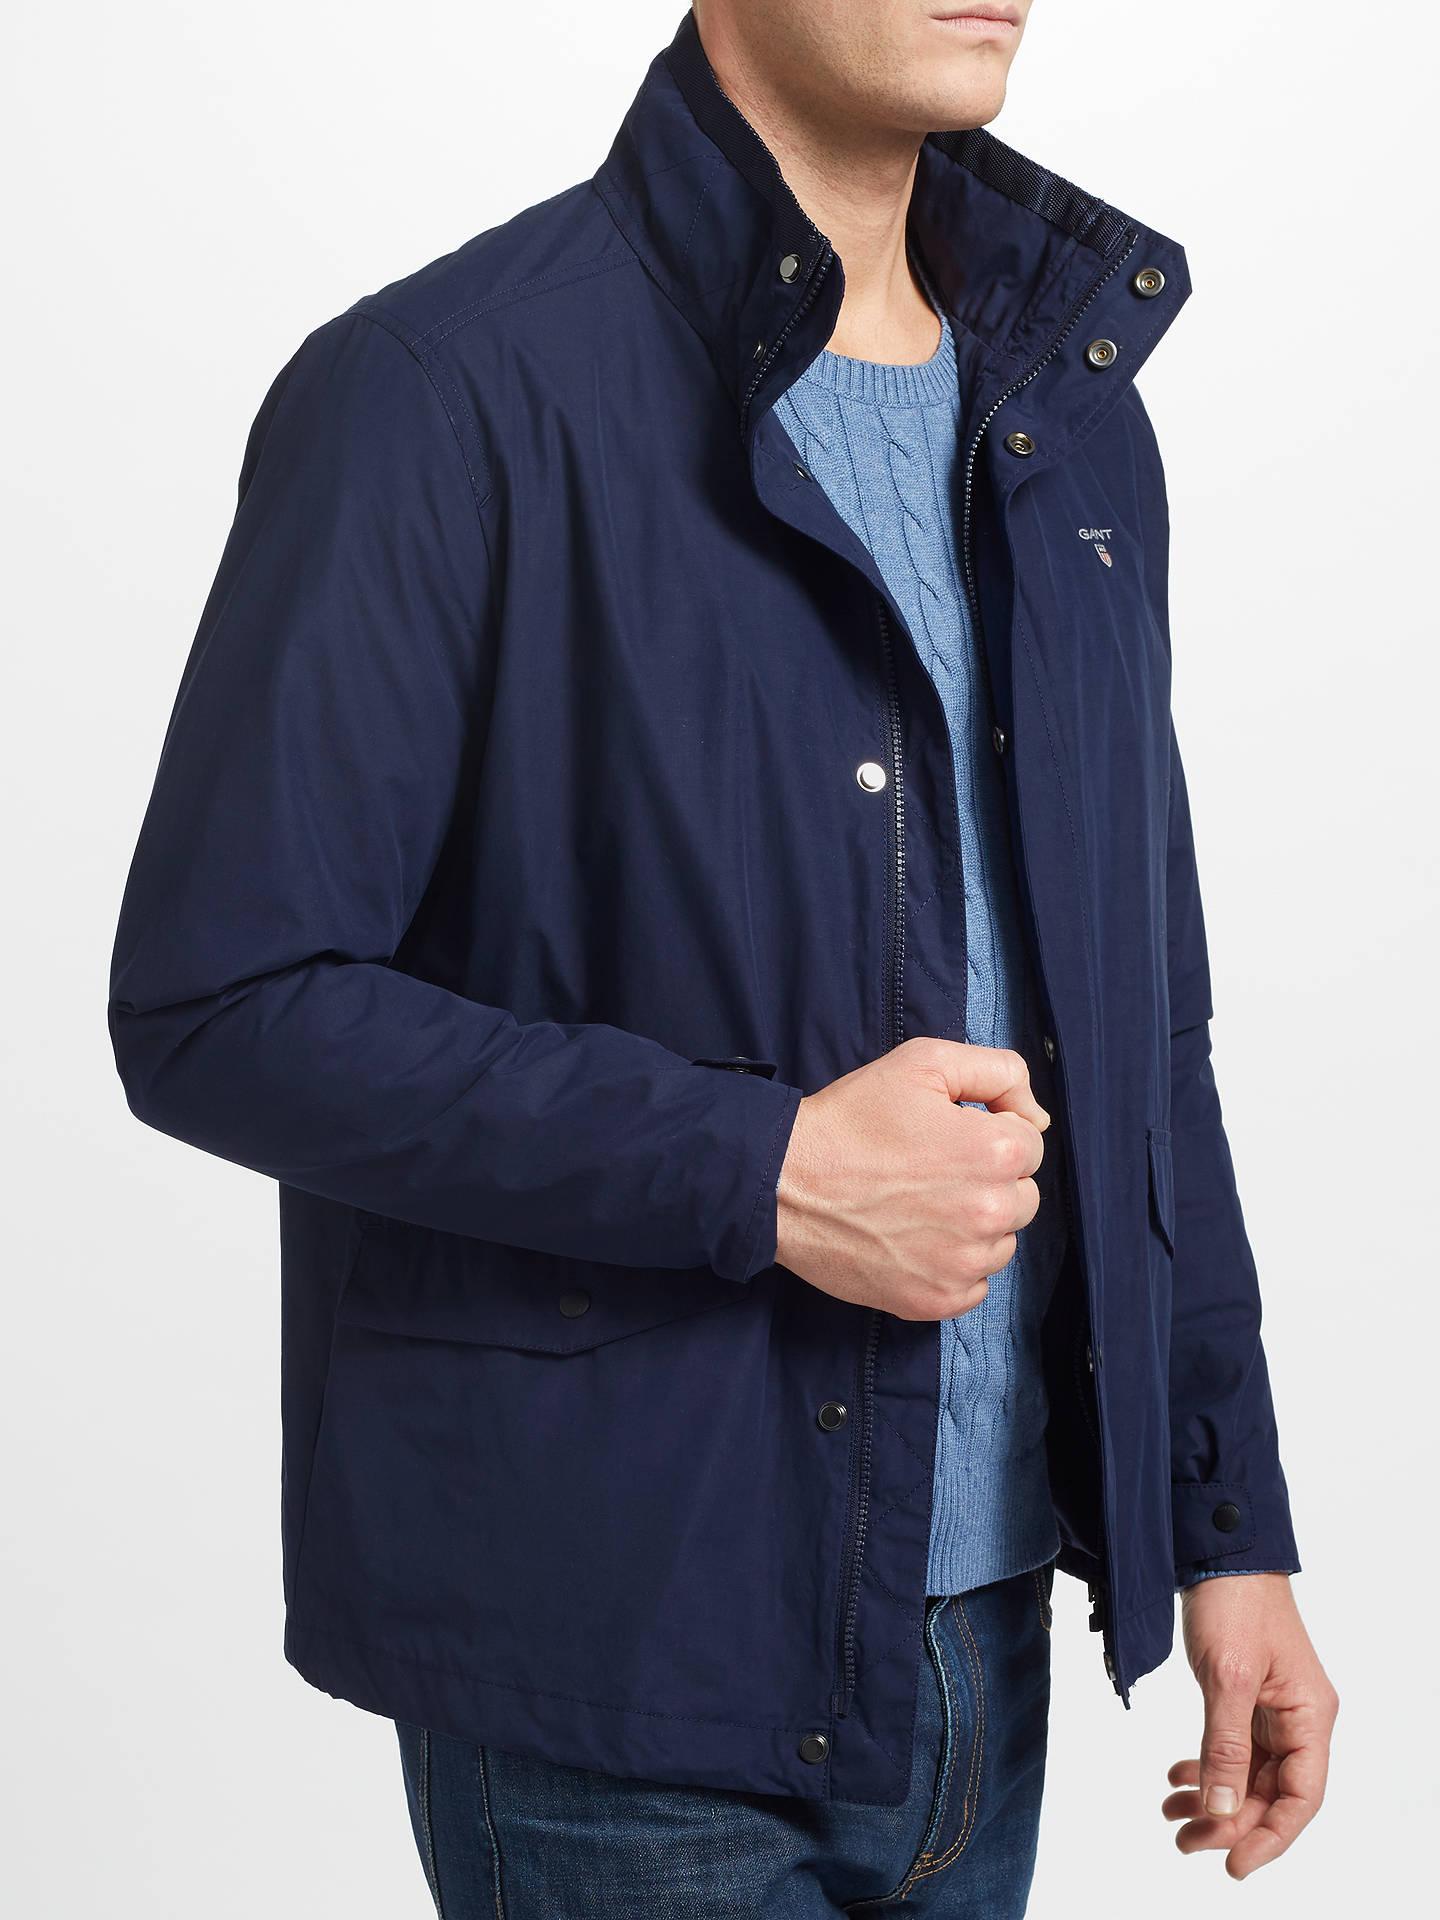 24be78205 GANT Shore Jacket at John Lewis & Partners